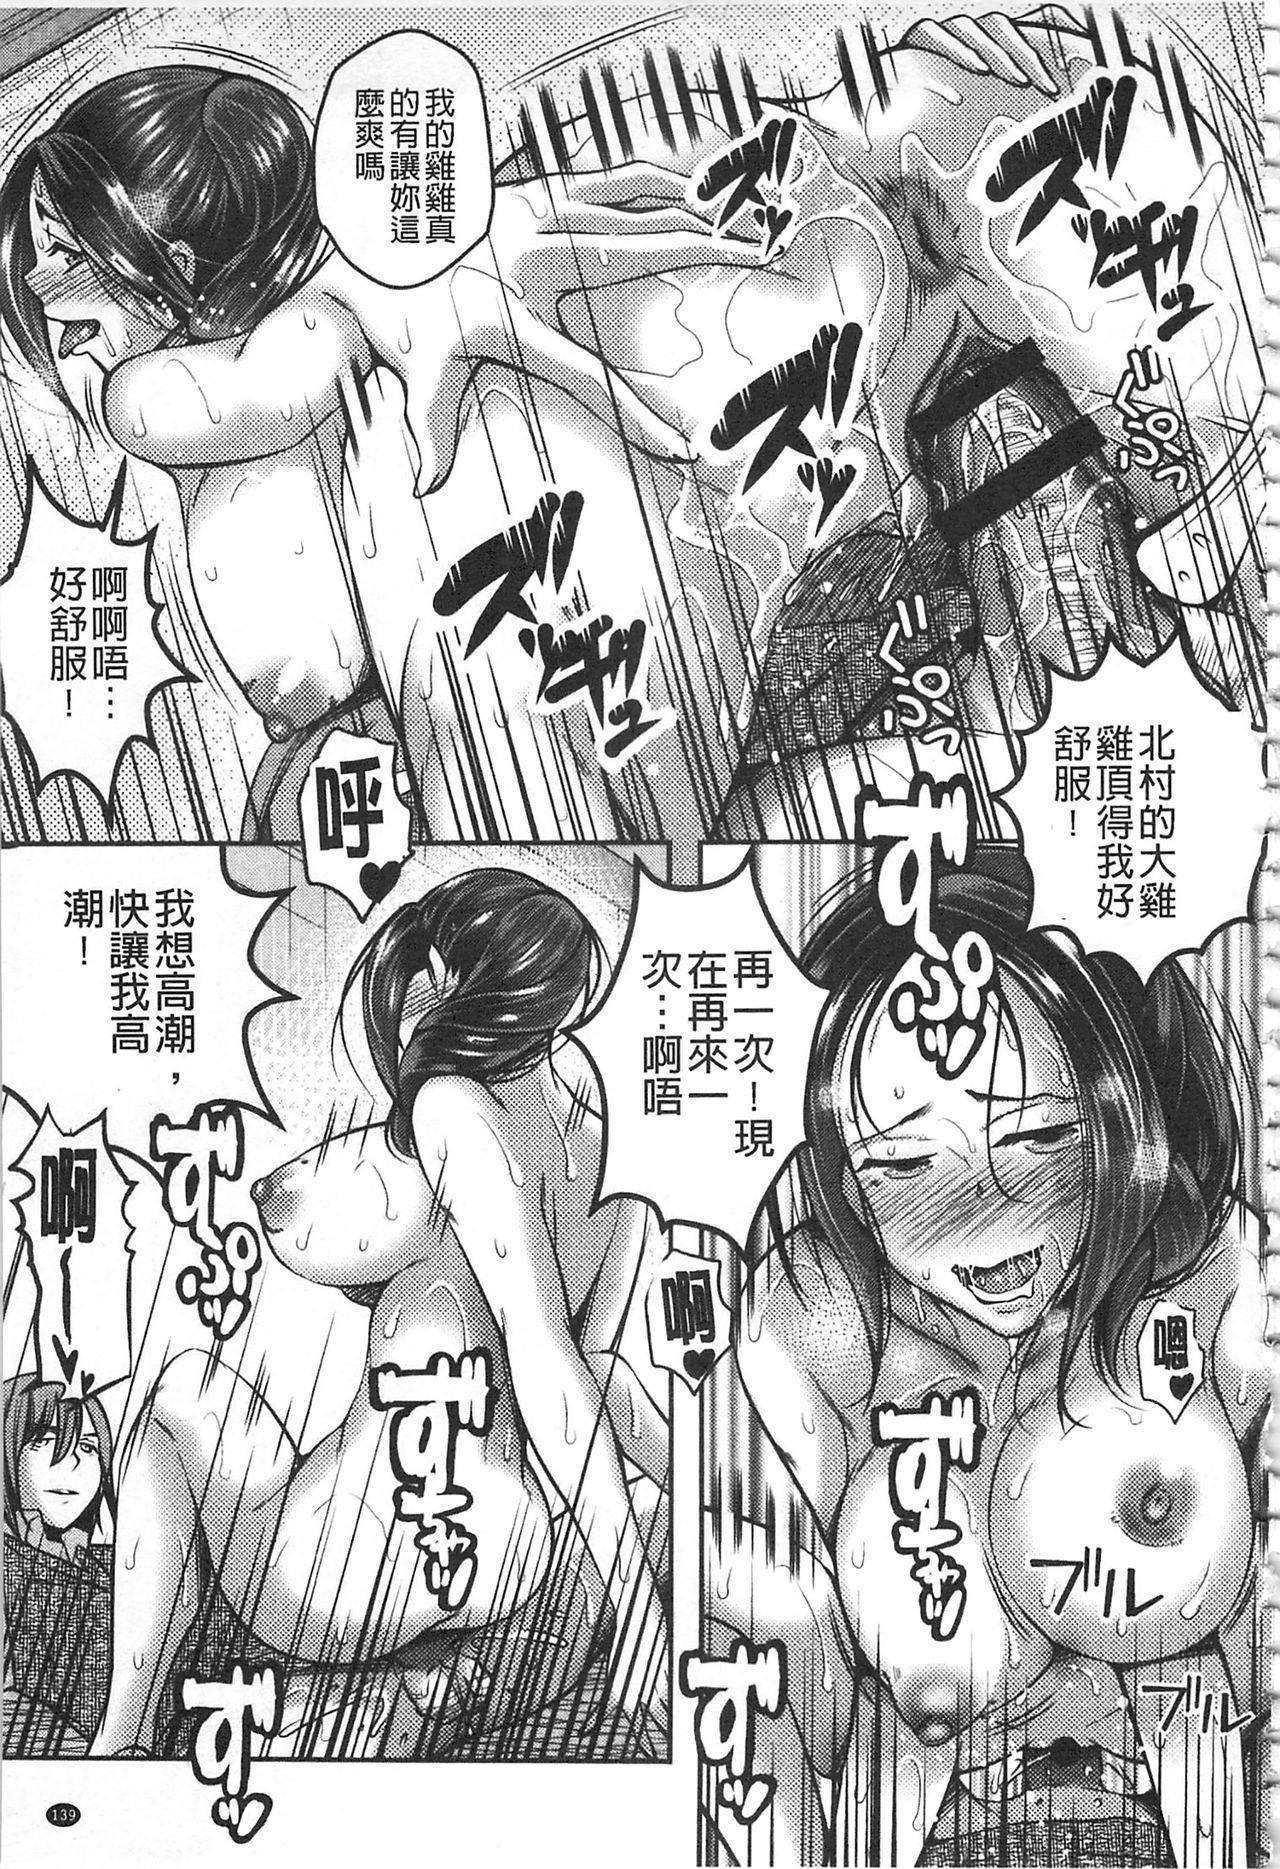 Kanjuku Otome no Odoshikata | 姦熟乙女的脅迫法 140